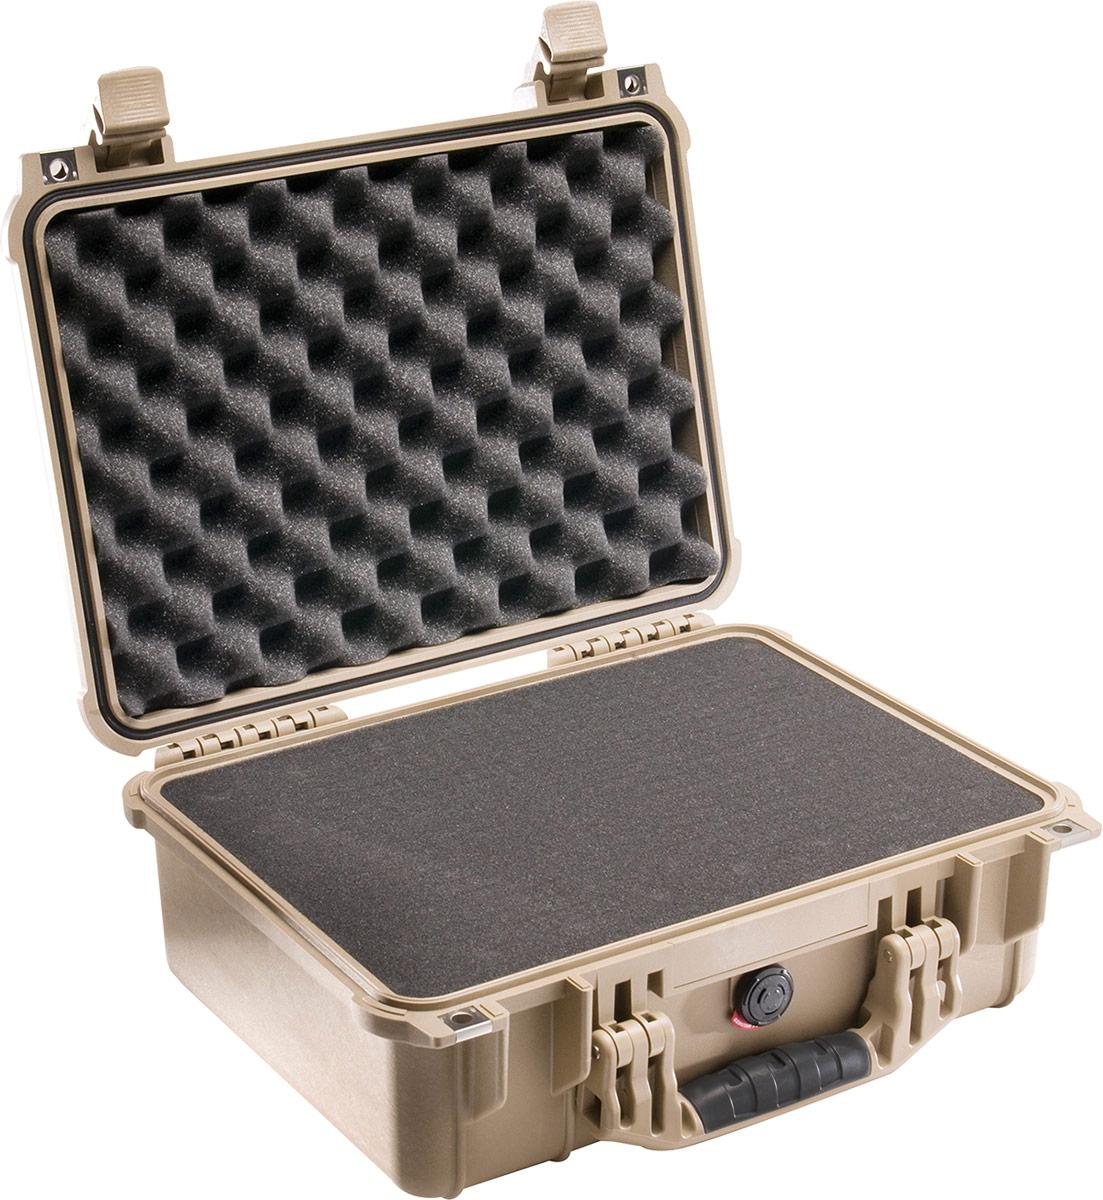 pelican 1450 desert tan protector case